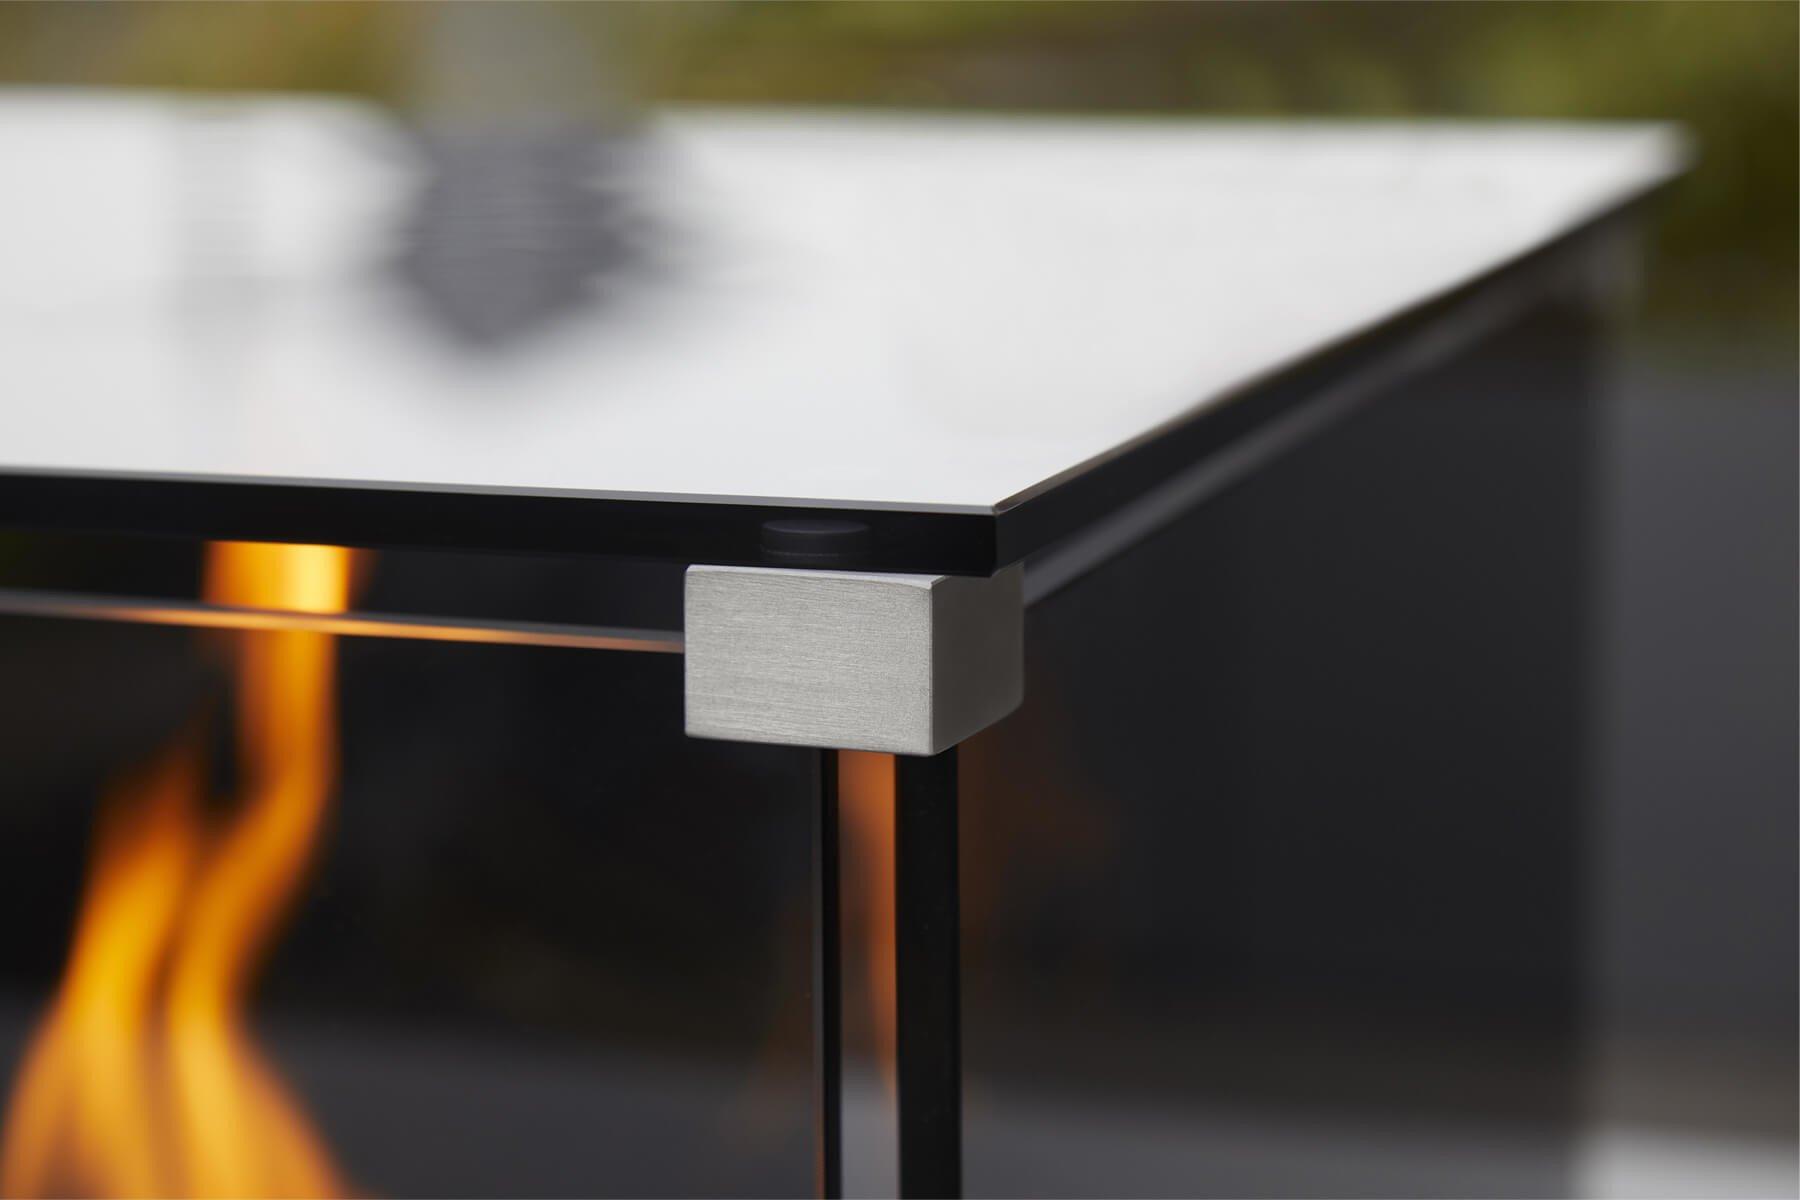 feuersaeule-aus-robustem-edelstahl-mit-geschlossenem-feuer-und-grau-glas